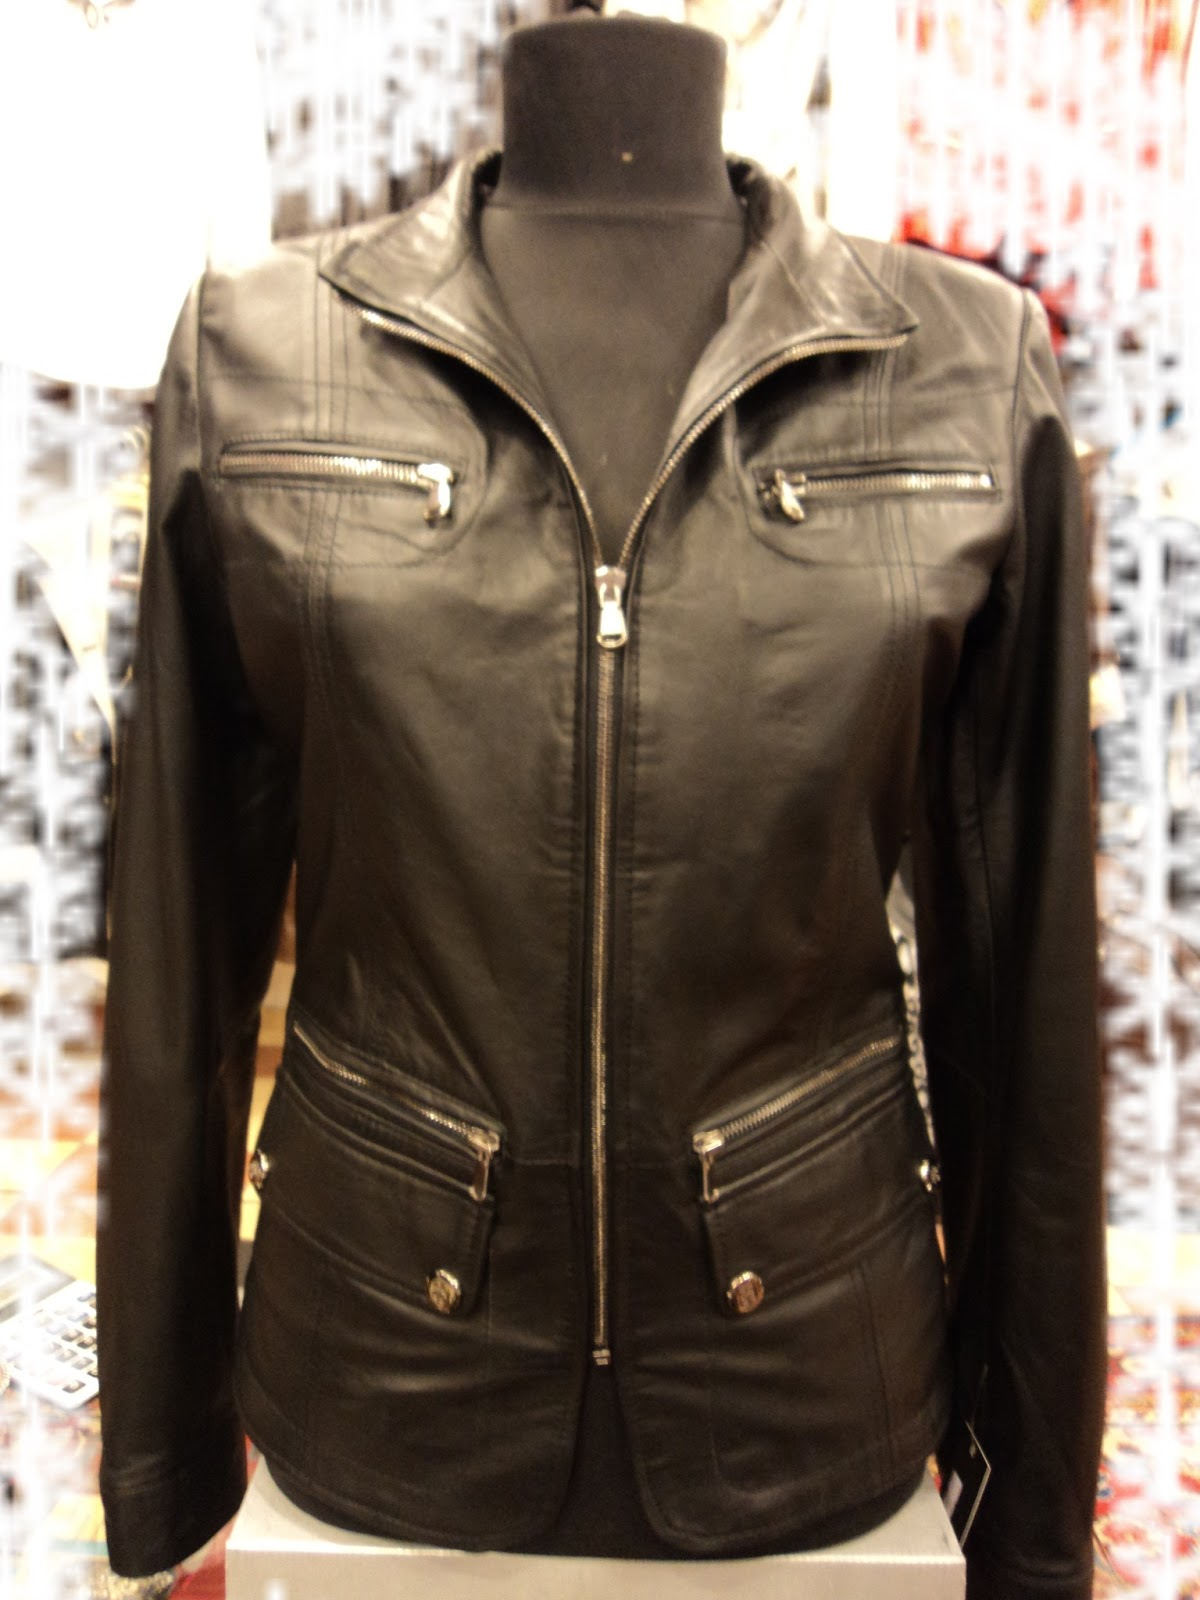 Jacket vest for women